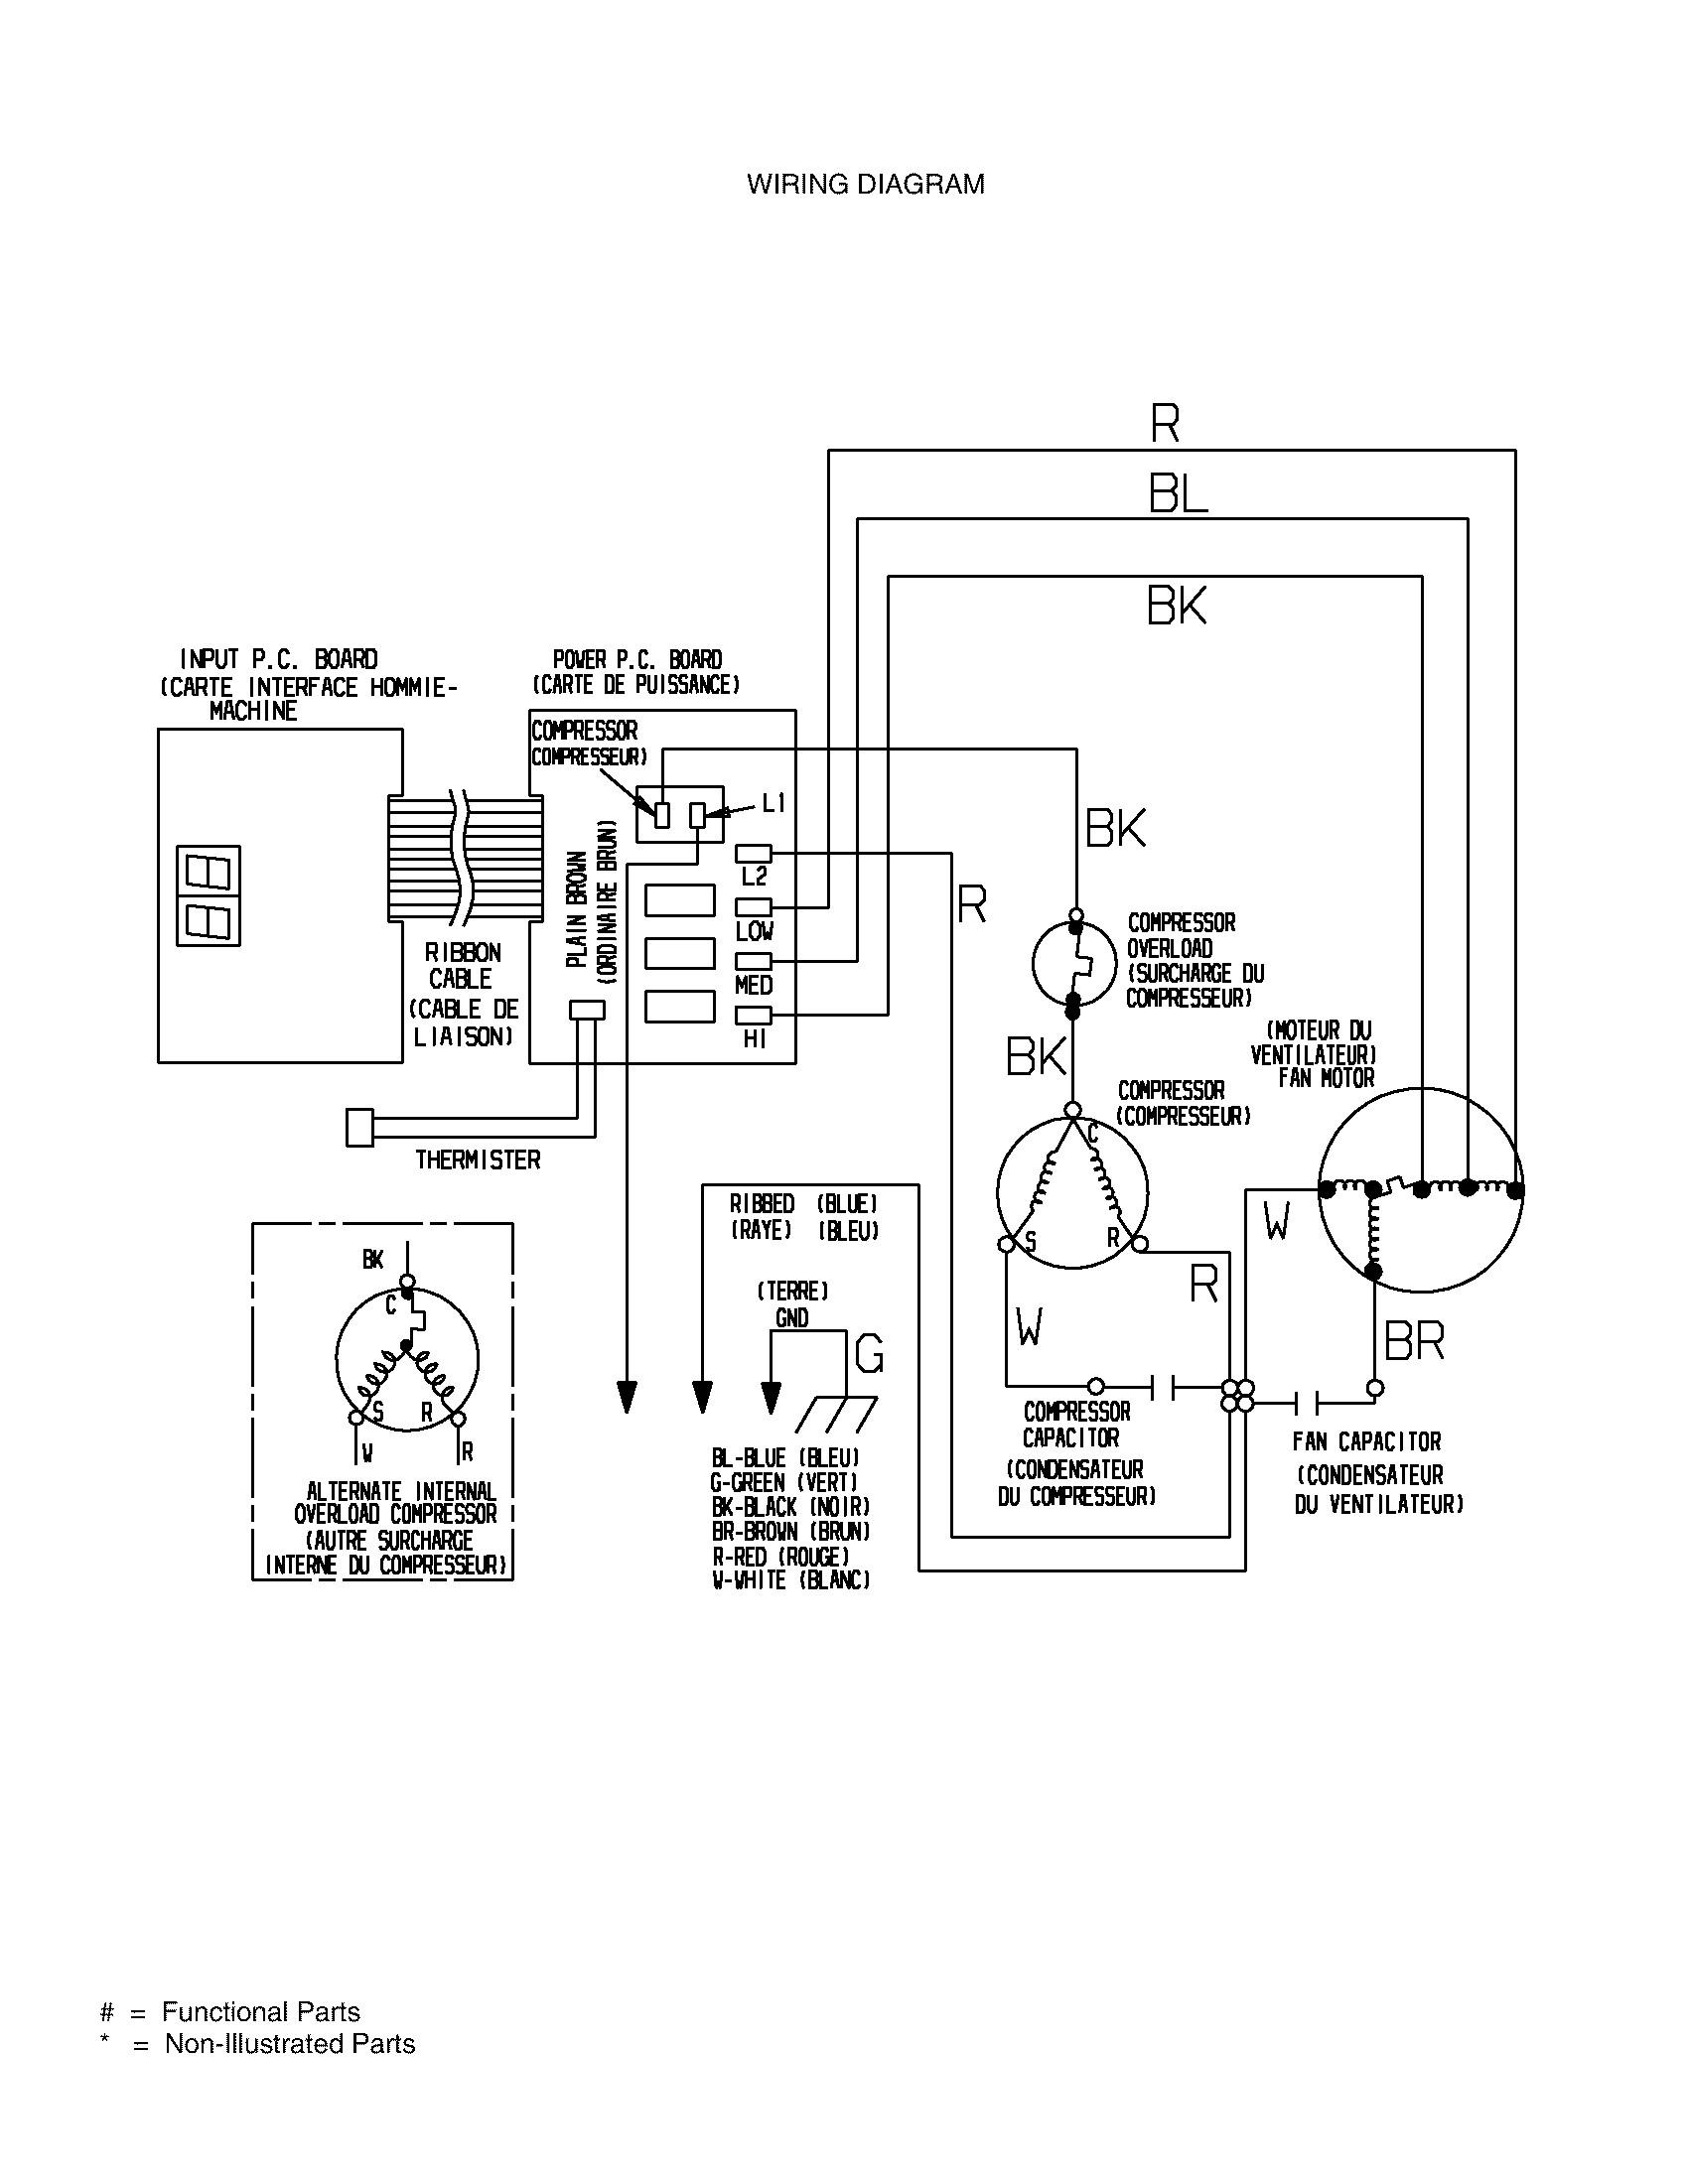 Sew Motor Internal Wiring Eurodrive Diagram 22017 Gould Contactor Database Movimot Asmrr Org Drn